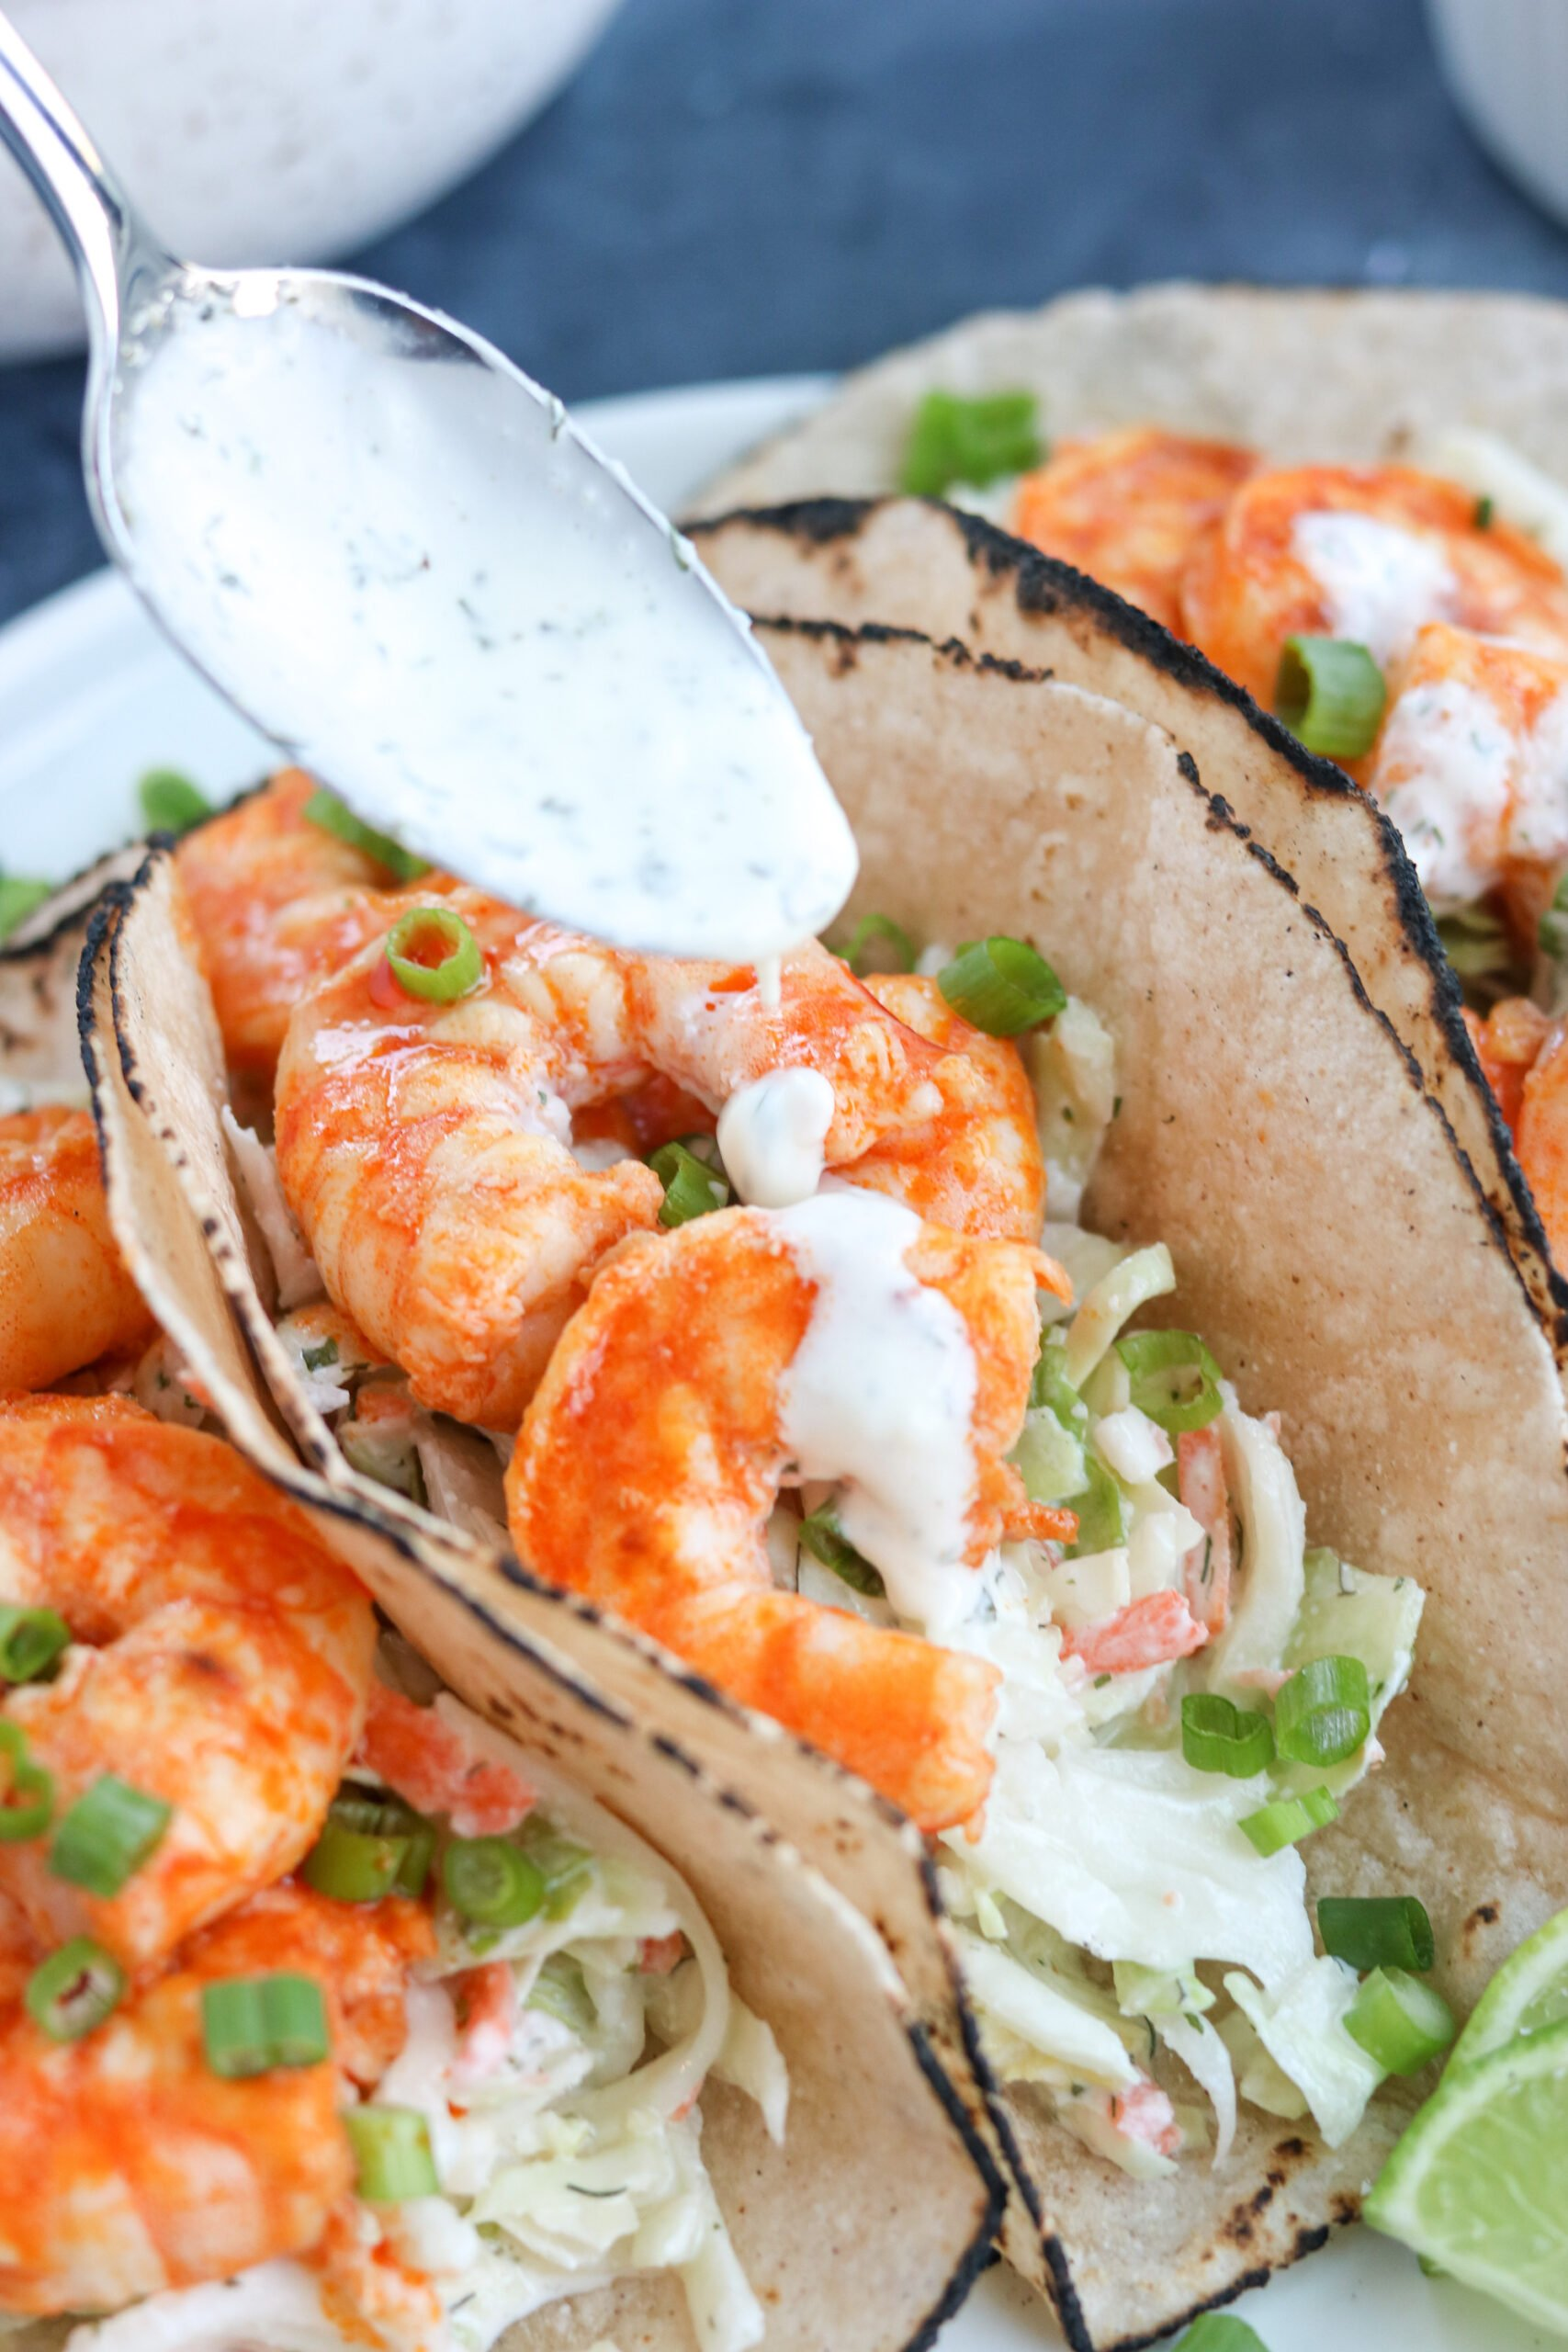 spoon adding sauce on a Paleo Buffalo Shrimp Tacos